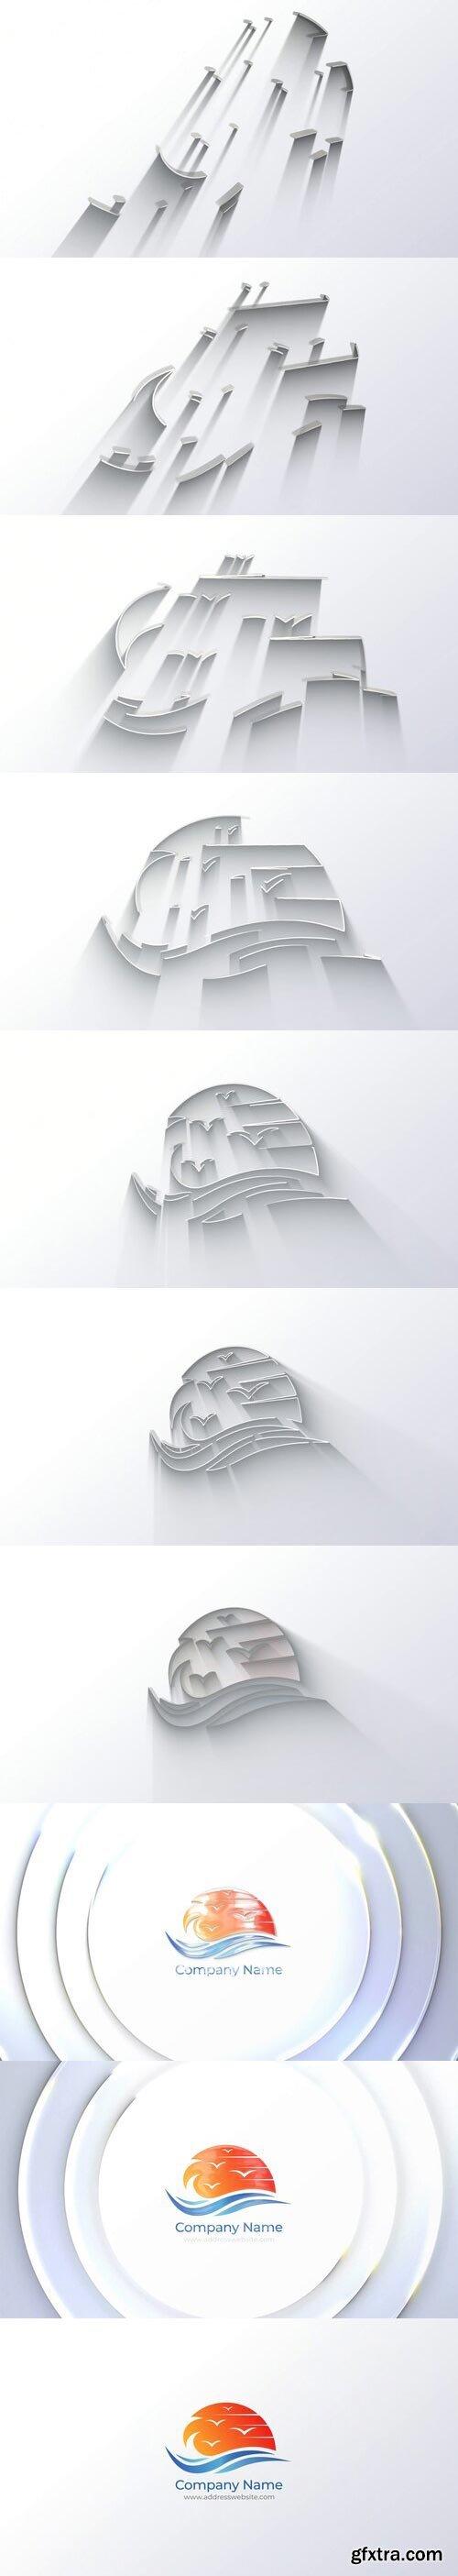 Videohive - Stylish 3D Logo - 30310073